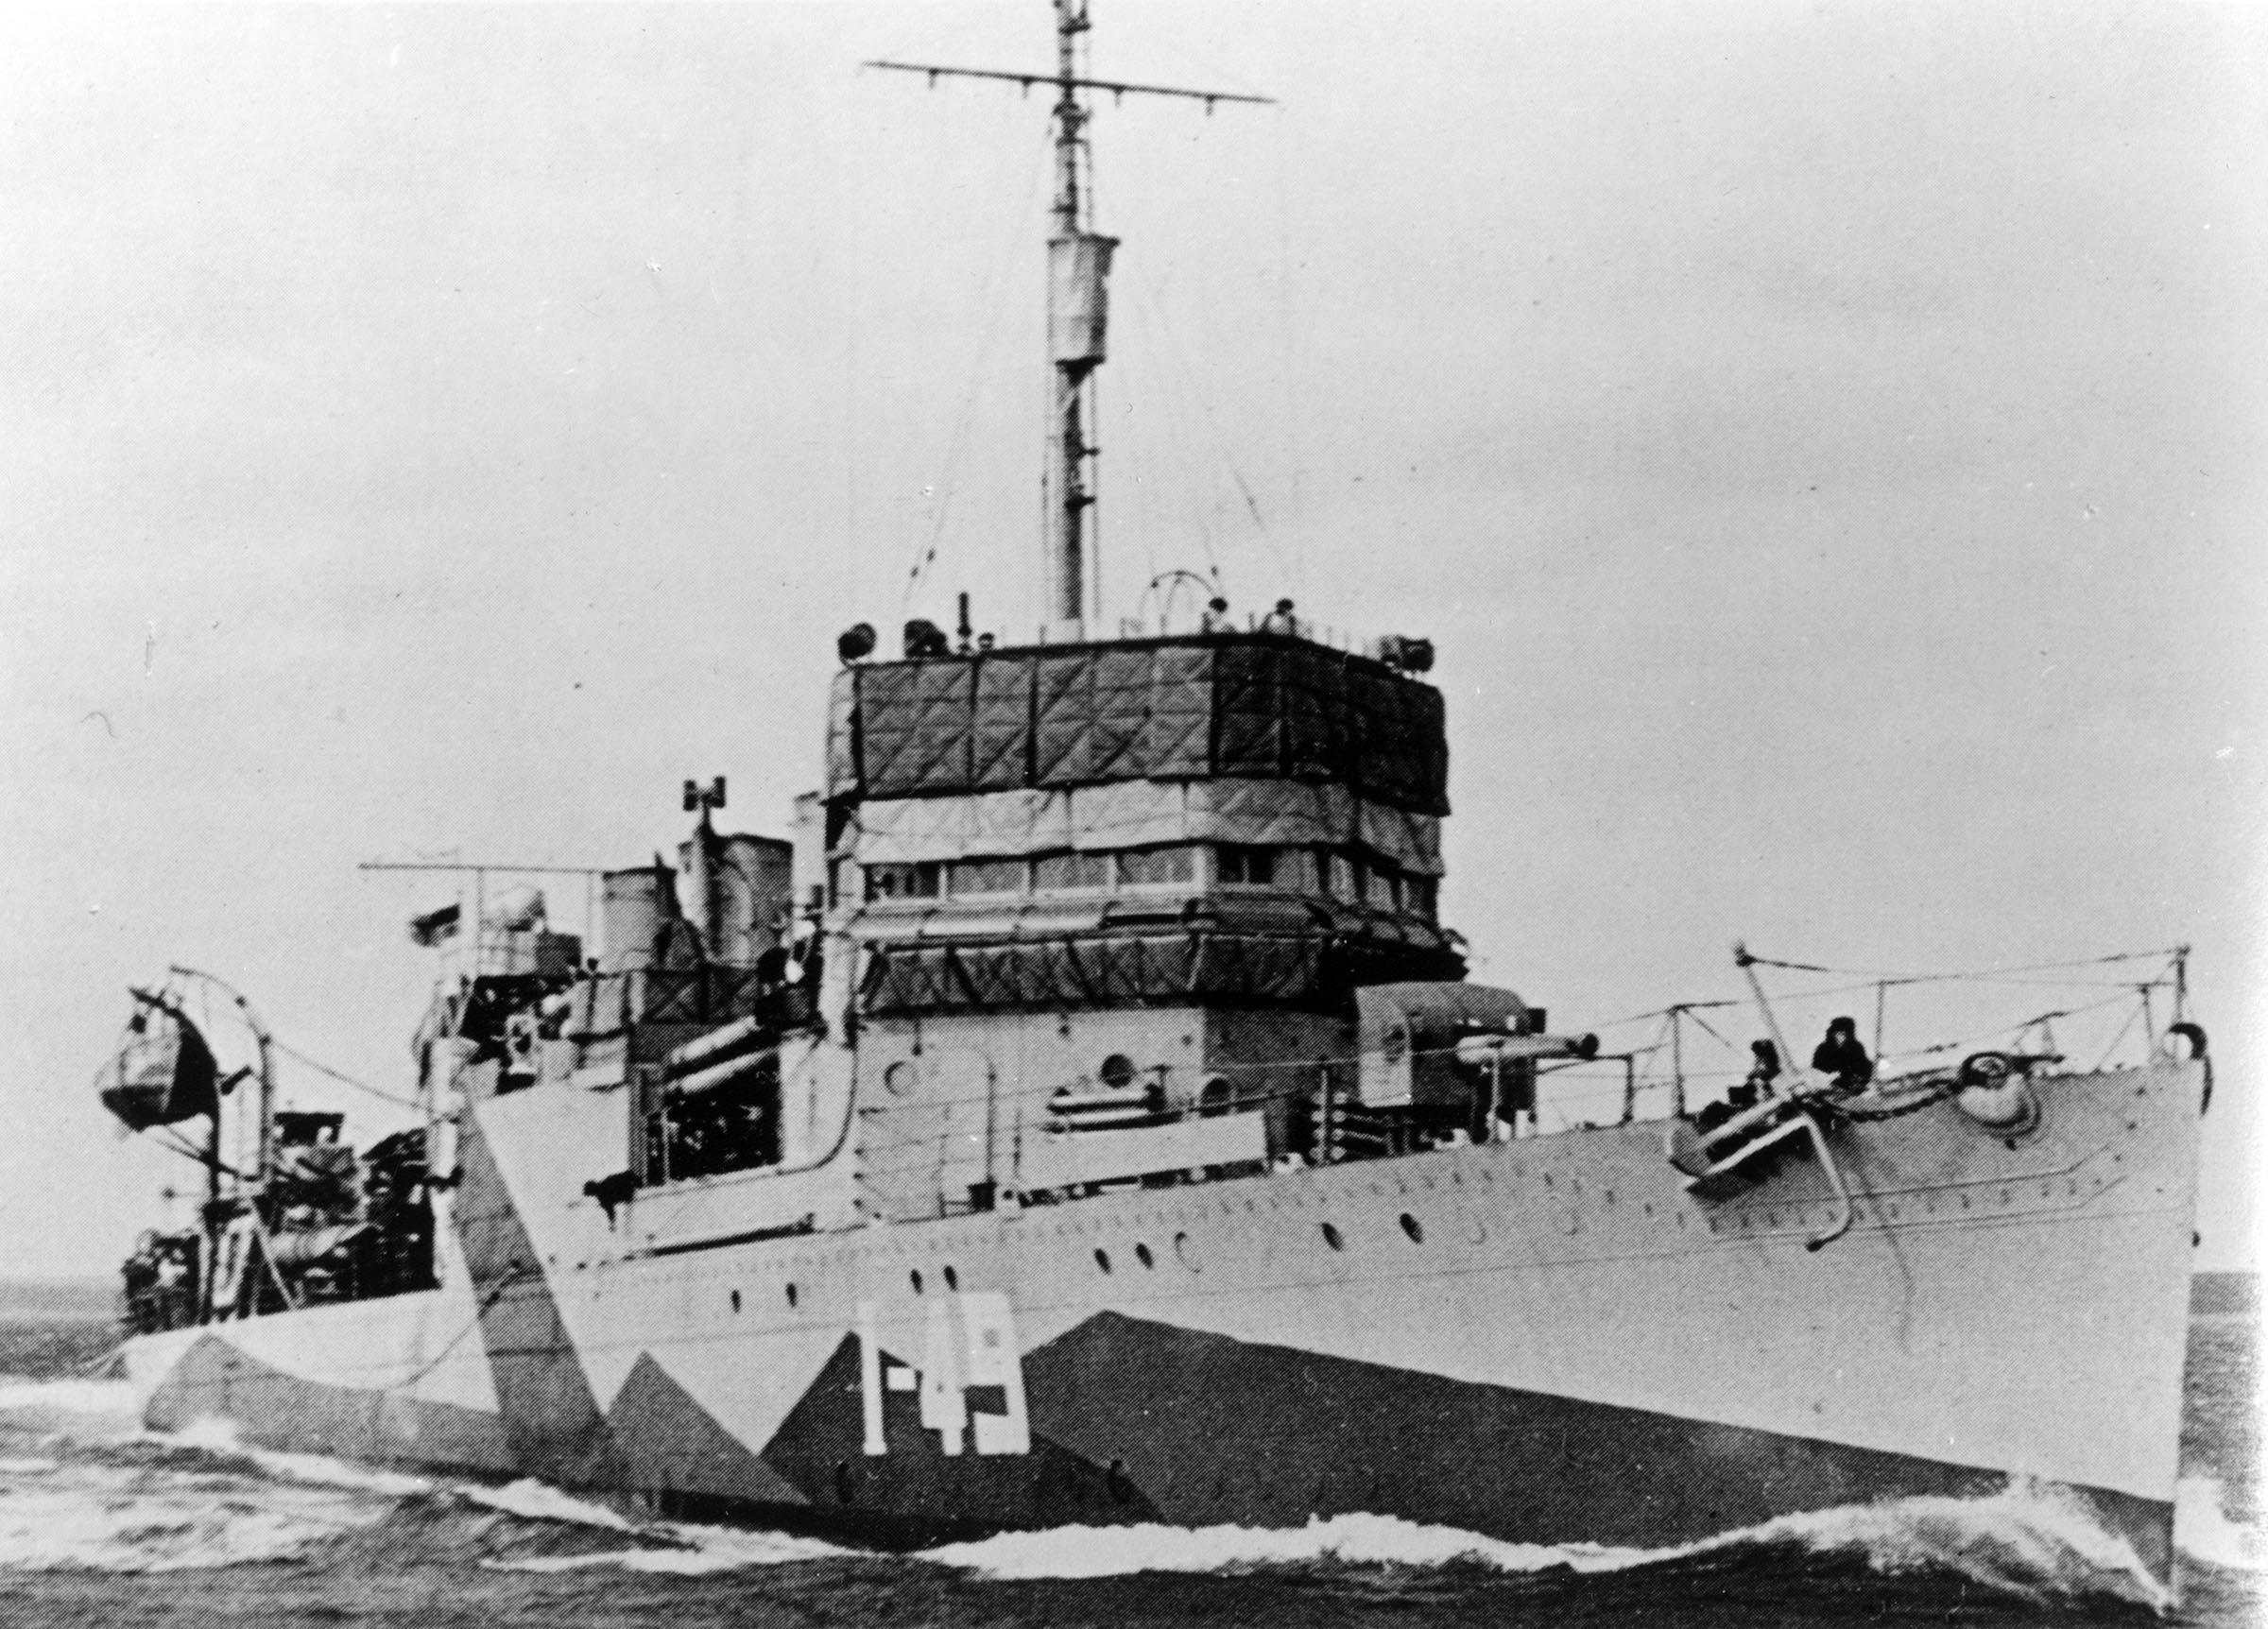 HMCS COLUMBIA (1st)